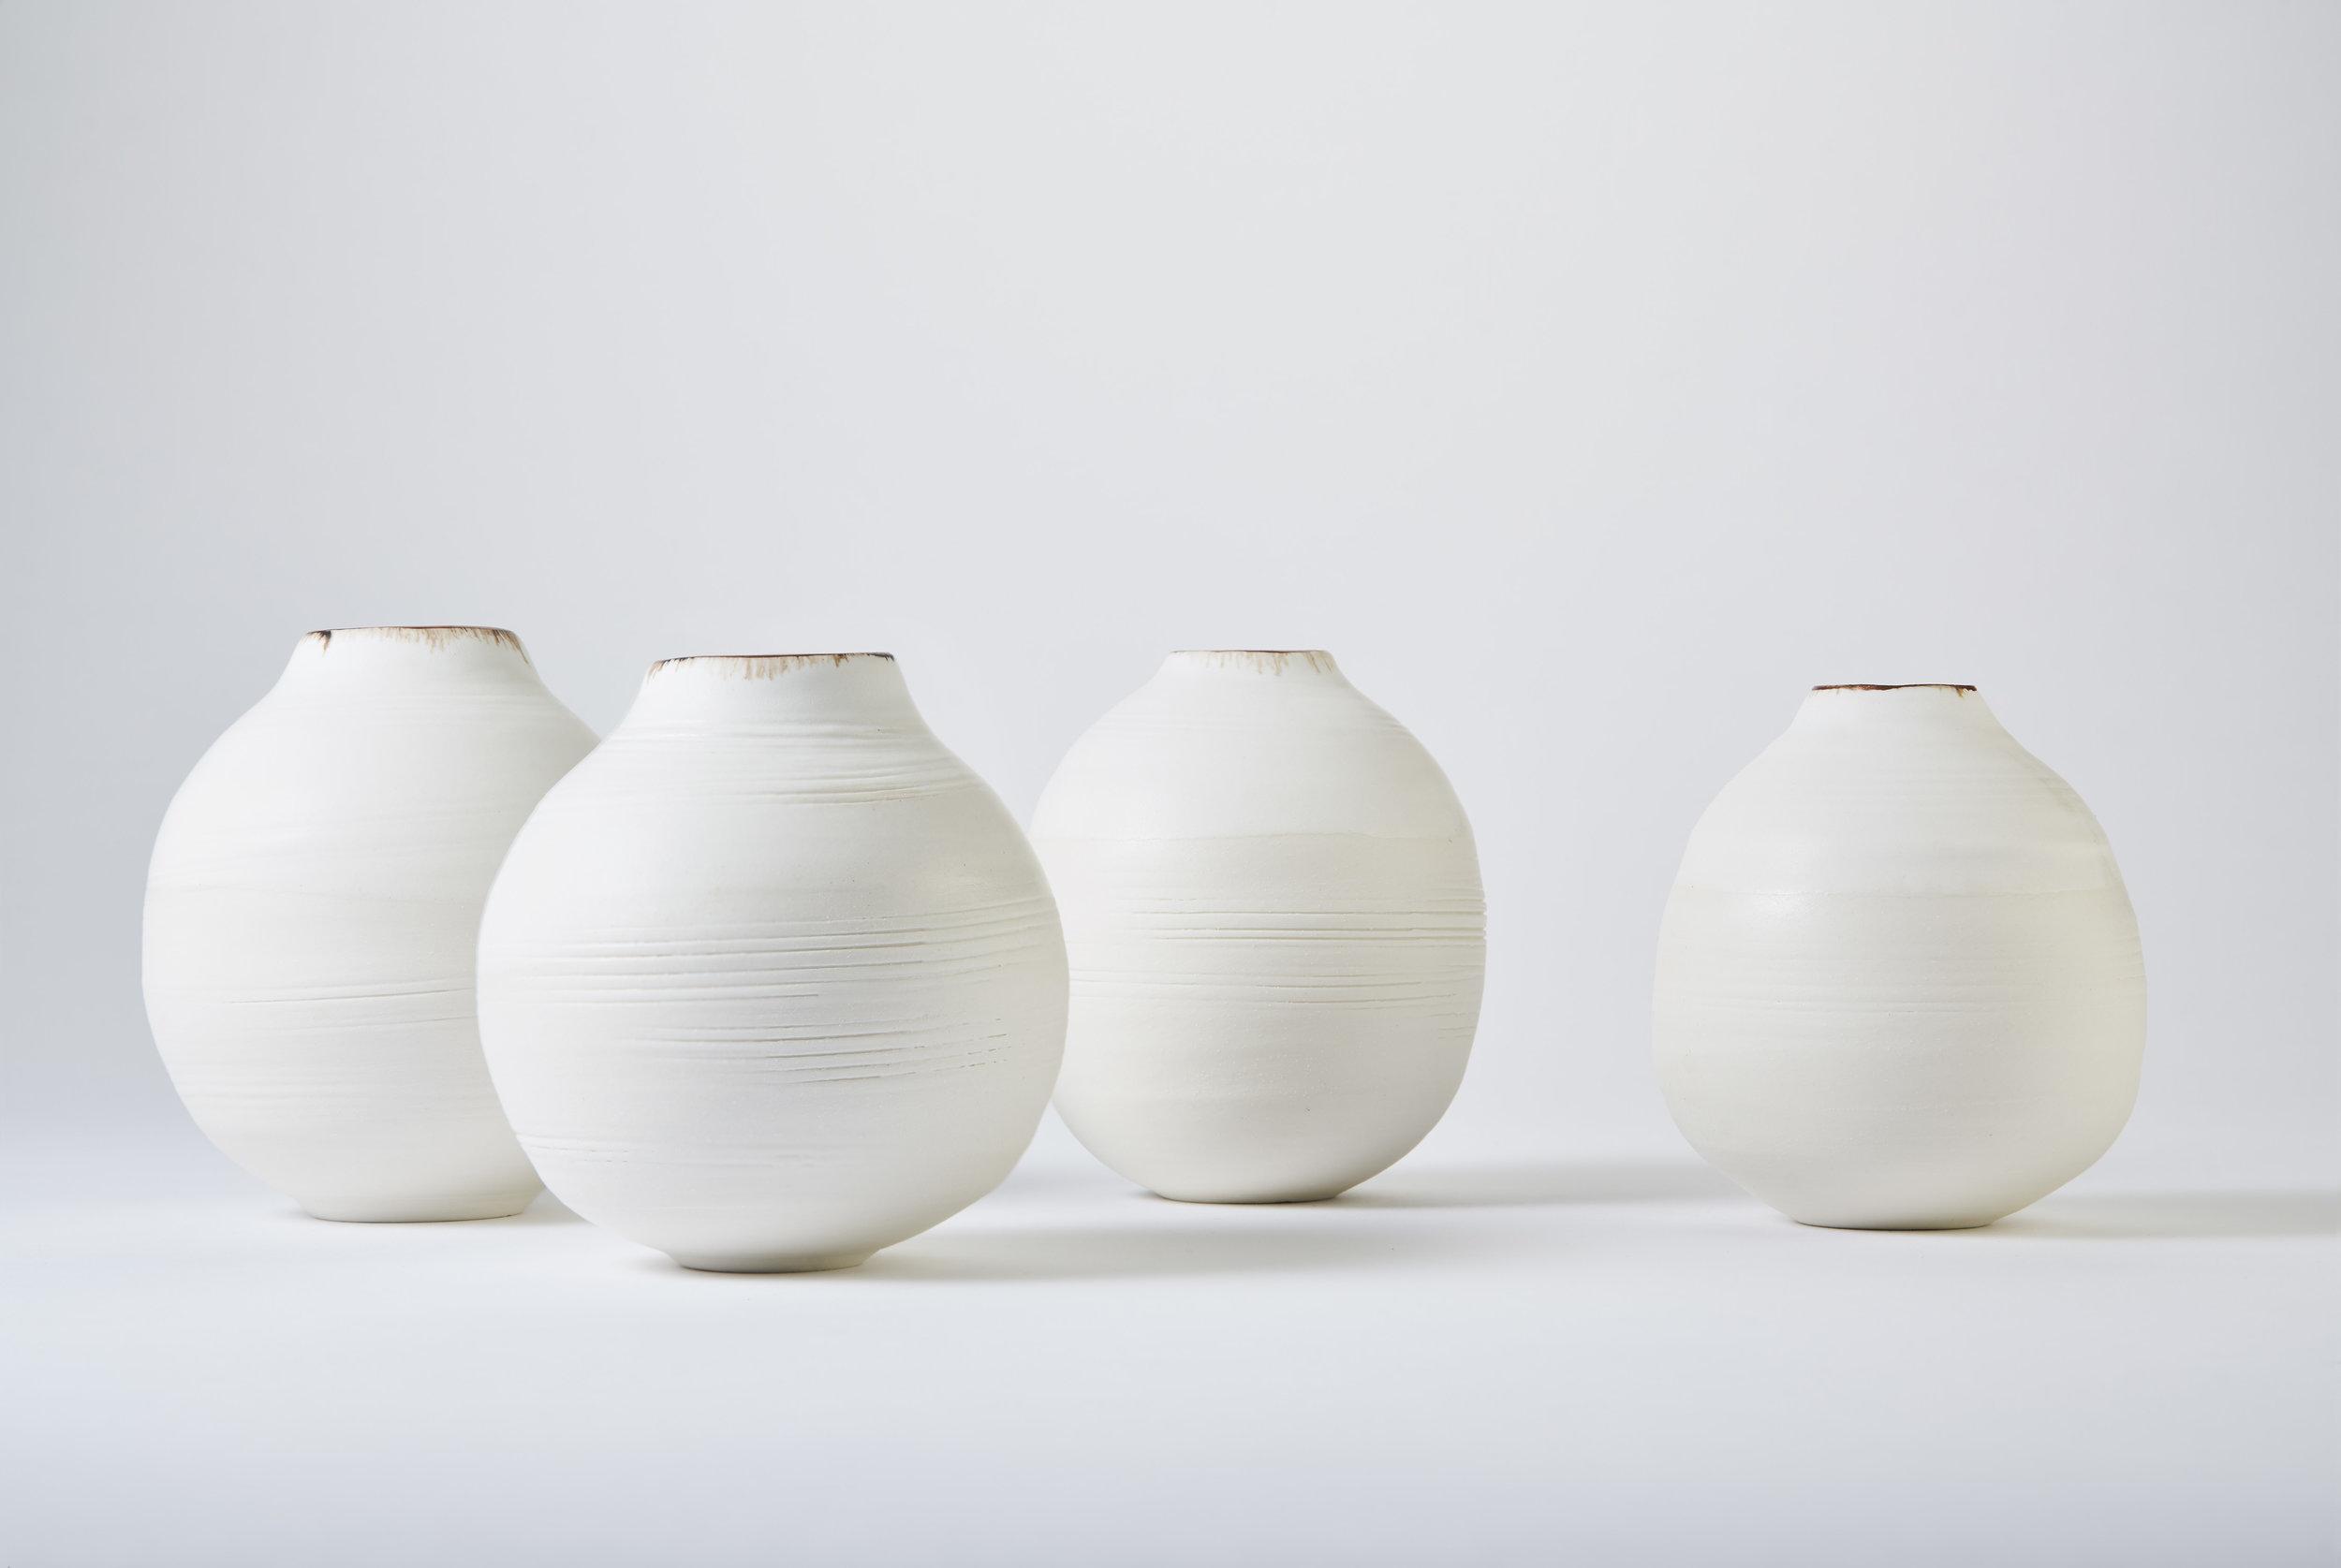 KA Ceramics Porcelain moon jars, dolomite and tin, bronze and oxide rim. Small 3.5cm x 11.5cm and 3cm x 11cm. Matthew Booth photography.jpg